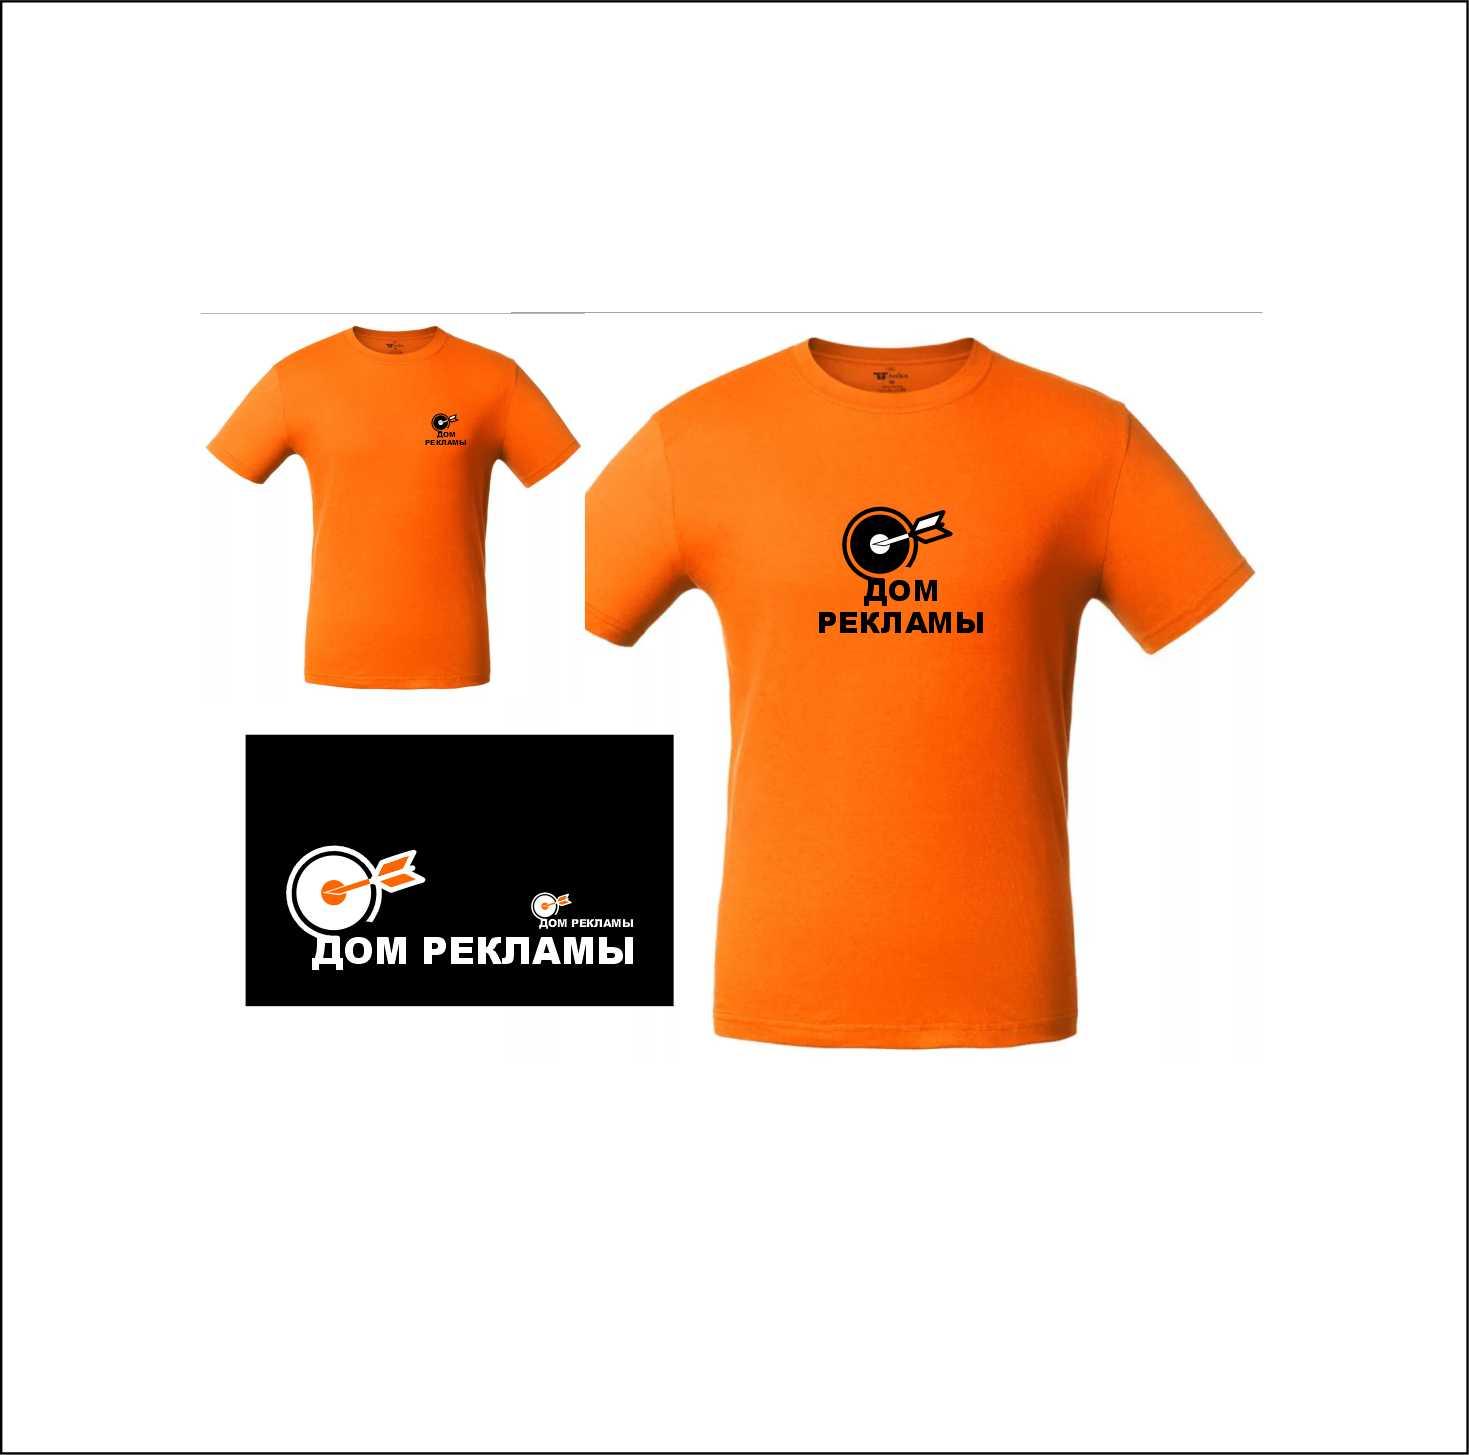 Дизайн логотипа рекламно-производственной компании фото f_3005edc89bd4b9e8.jpg